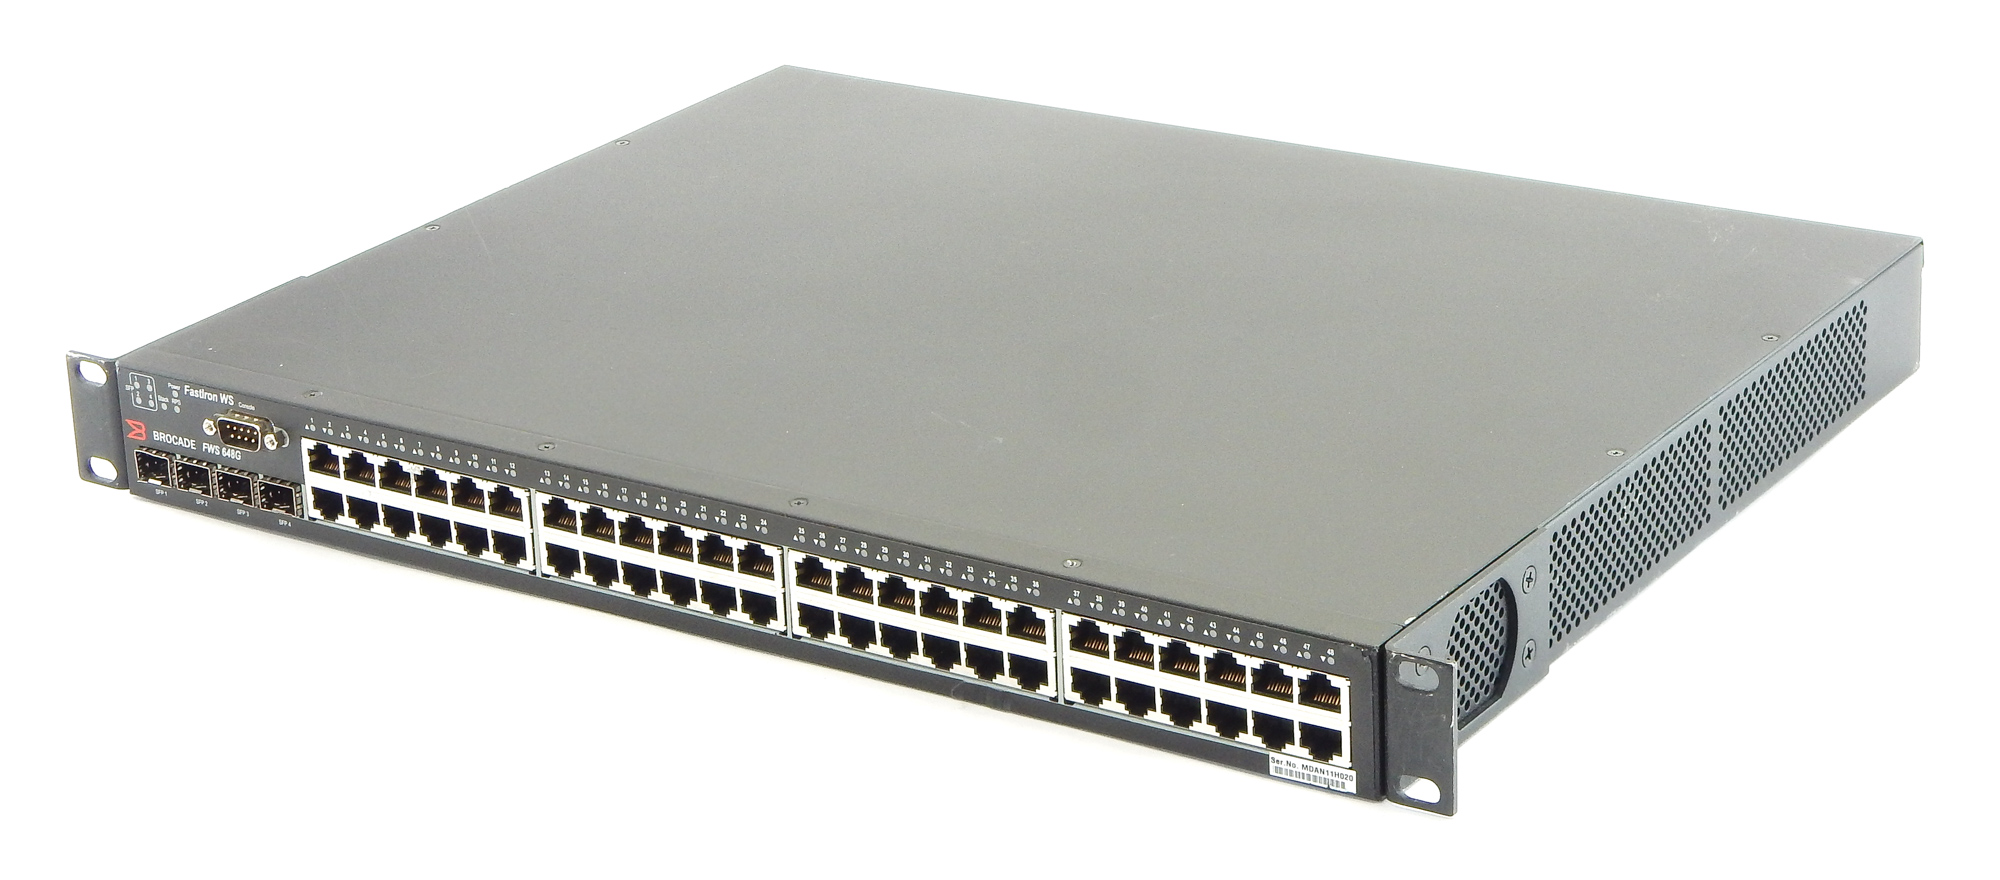 Brocade FWS648G FastIron WS Managed 48 Ports Ethernet Gigabit Switch